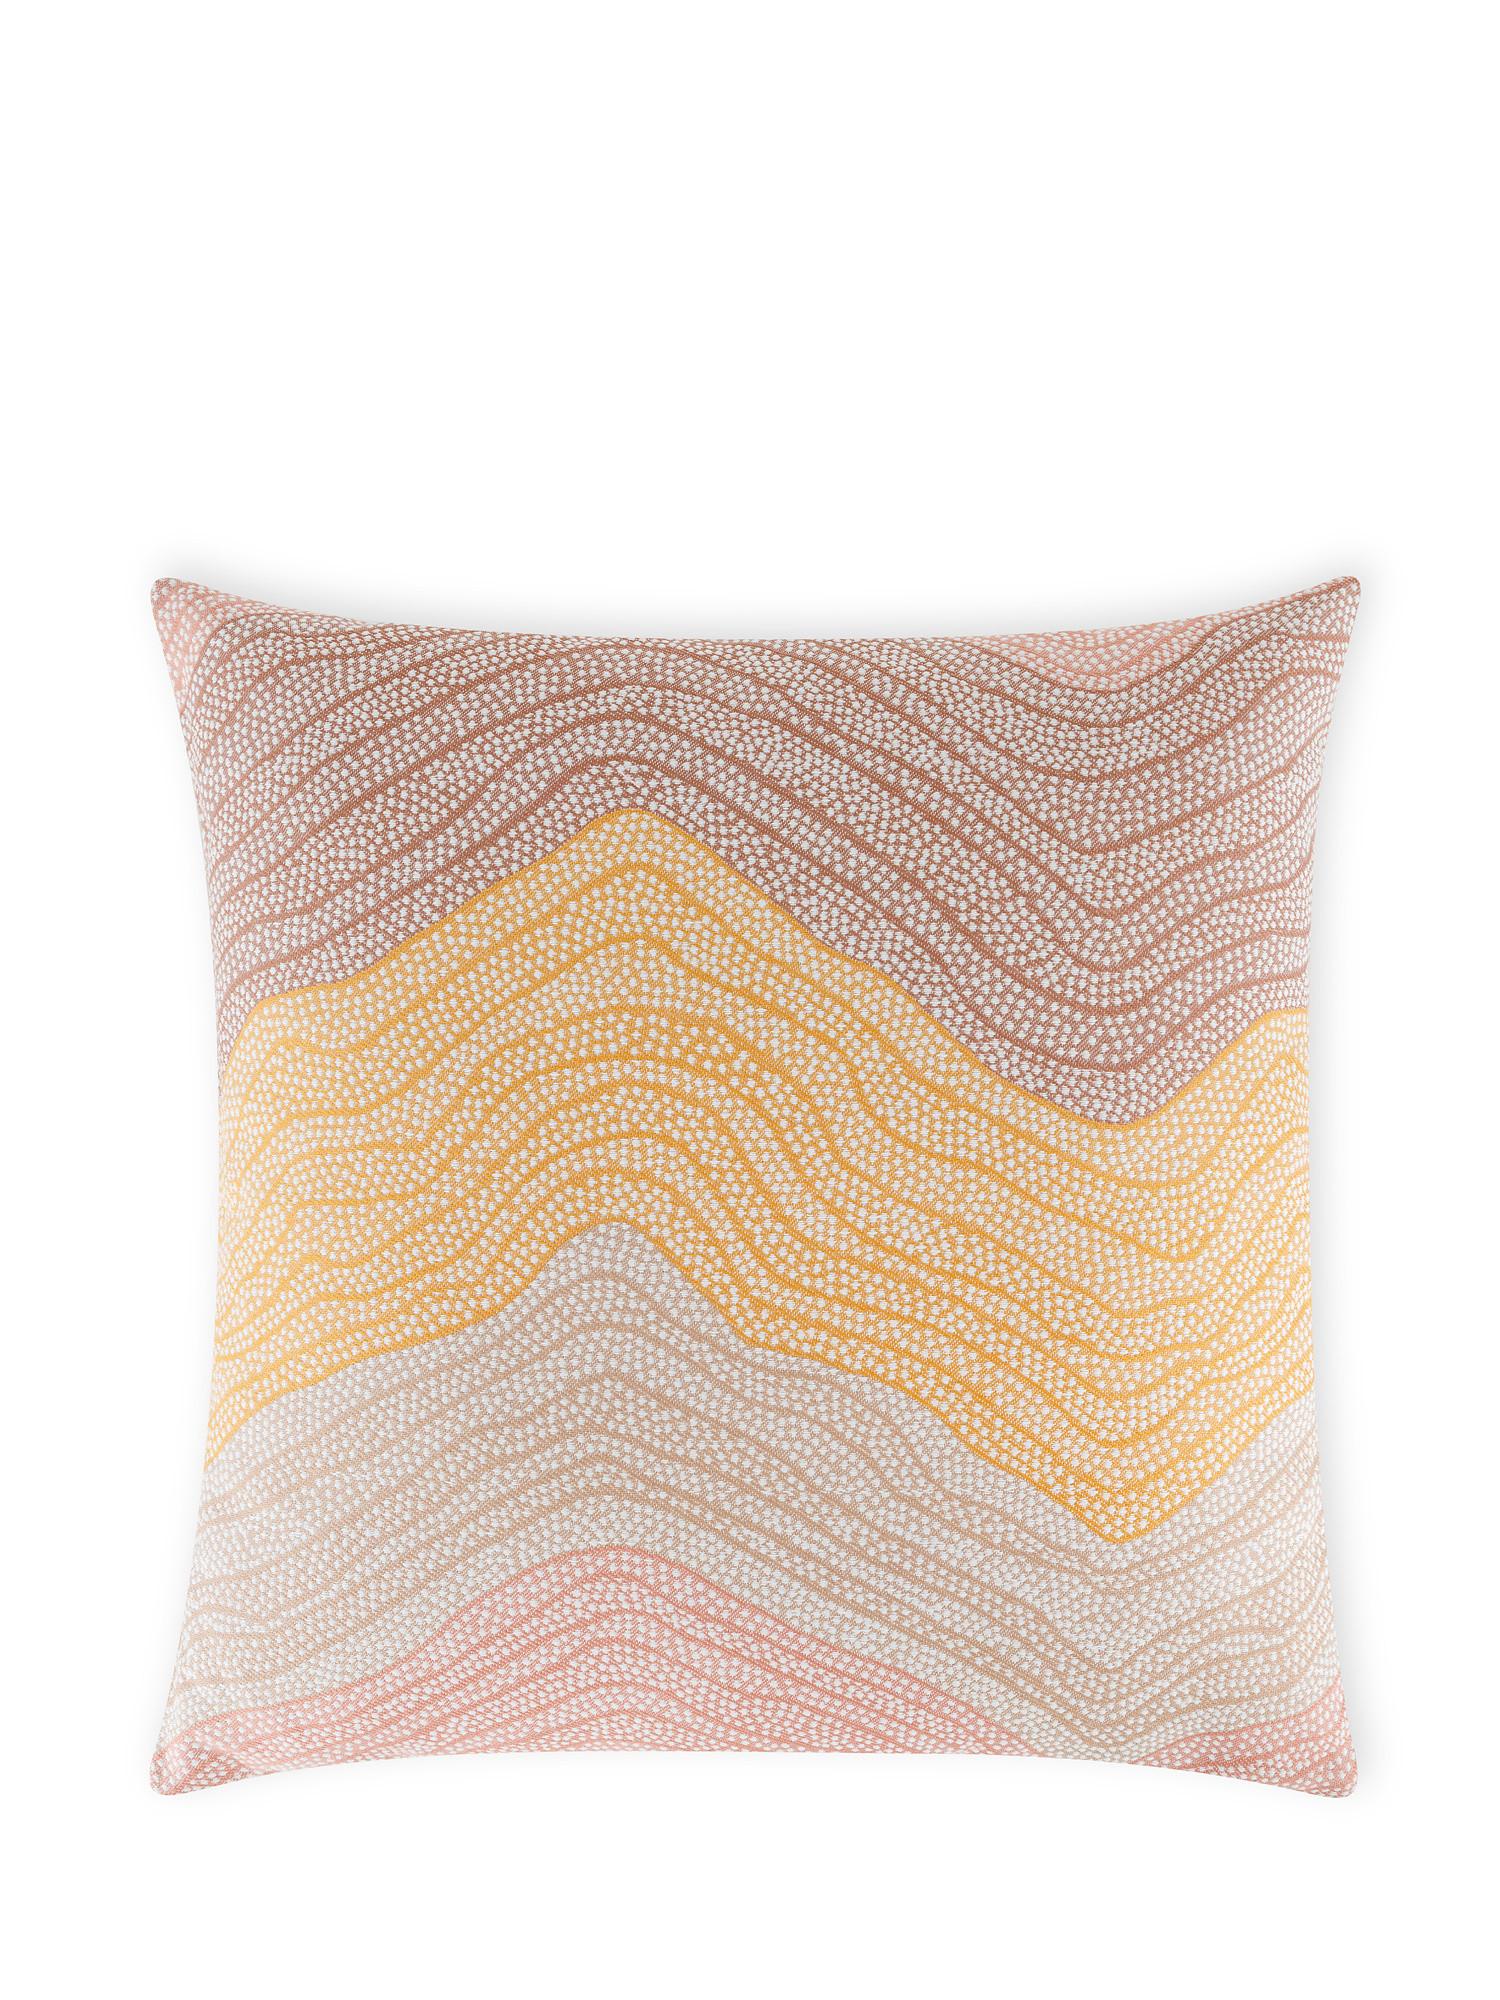 Cuscino tessuto jacquard spalmato 43x43cm, Multicolor, large image number 1